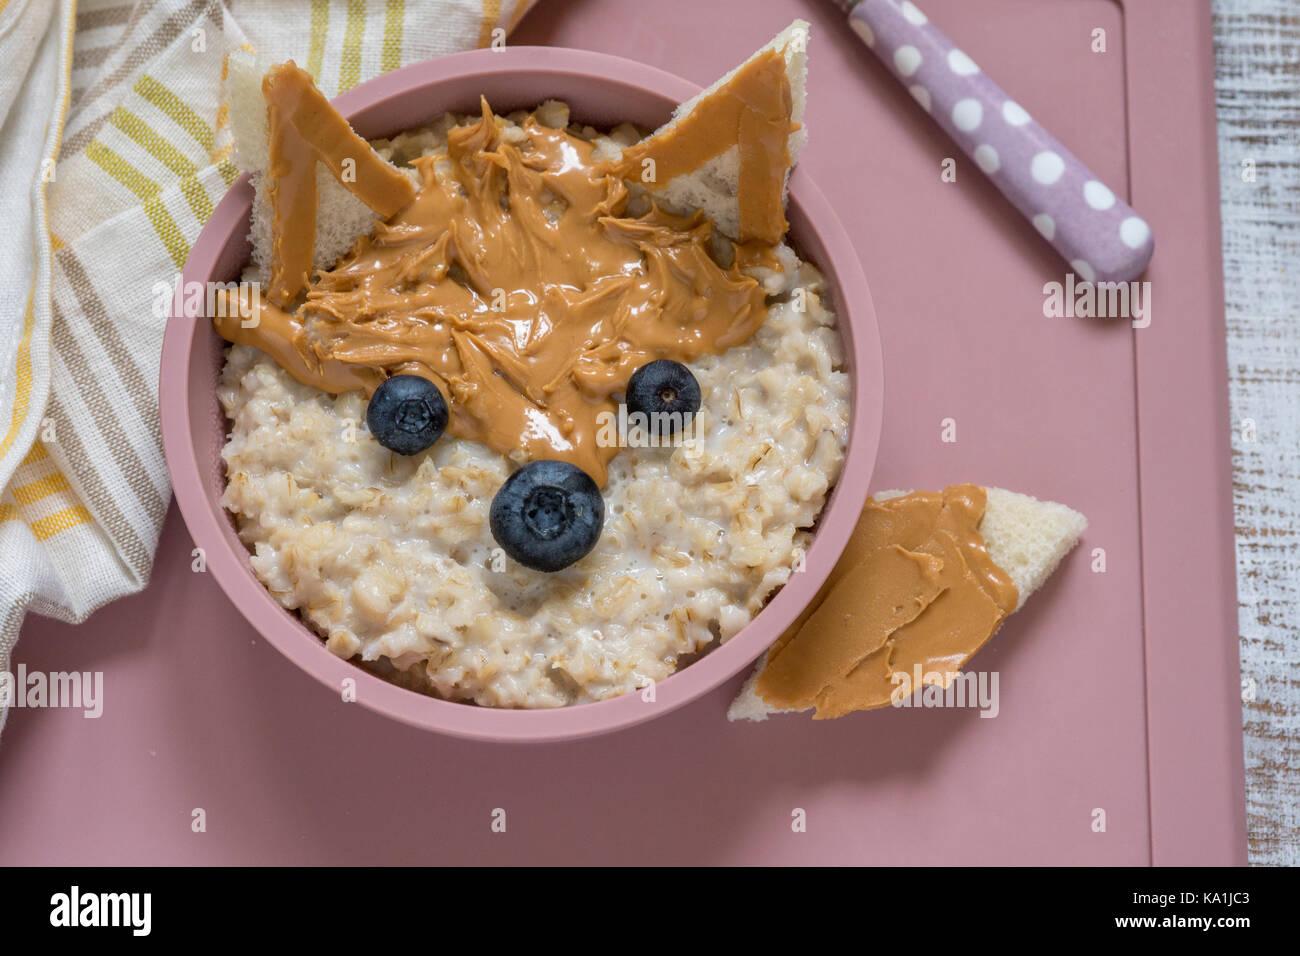 Fox Nut Stock Photos & Fox Nut Stock Images